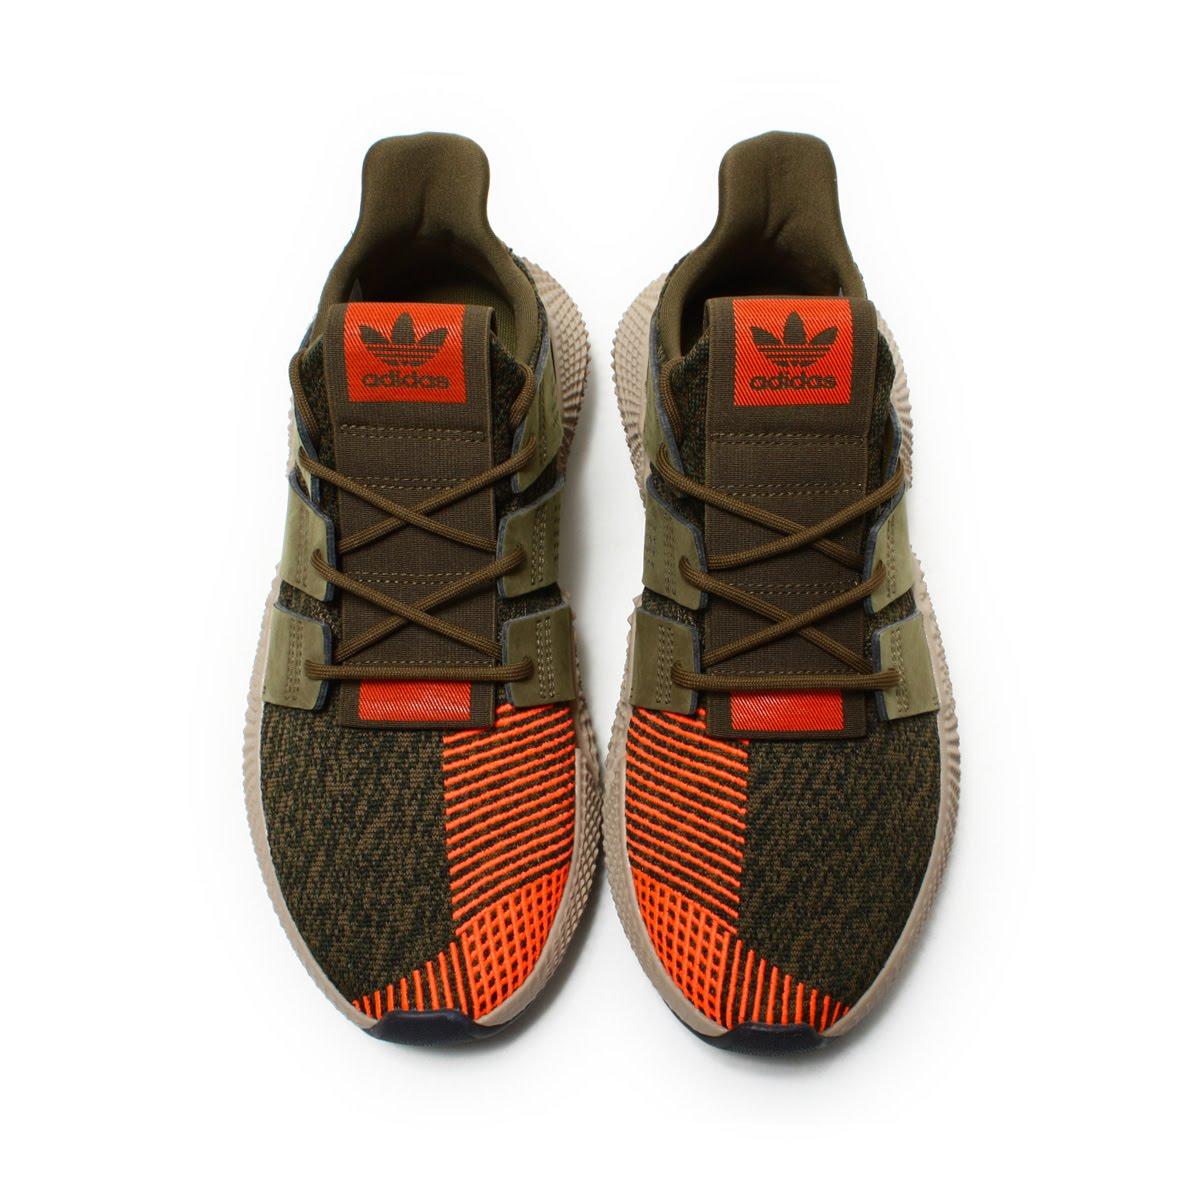 adidas PROPHERE (Adidas pro Fear) core black core black core black 18FW I